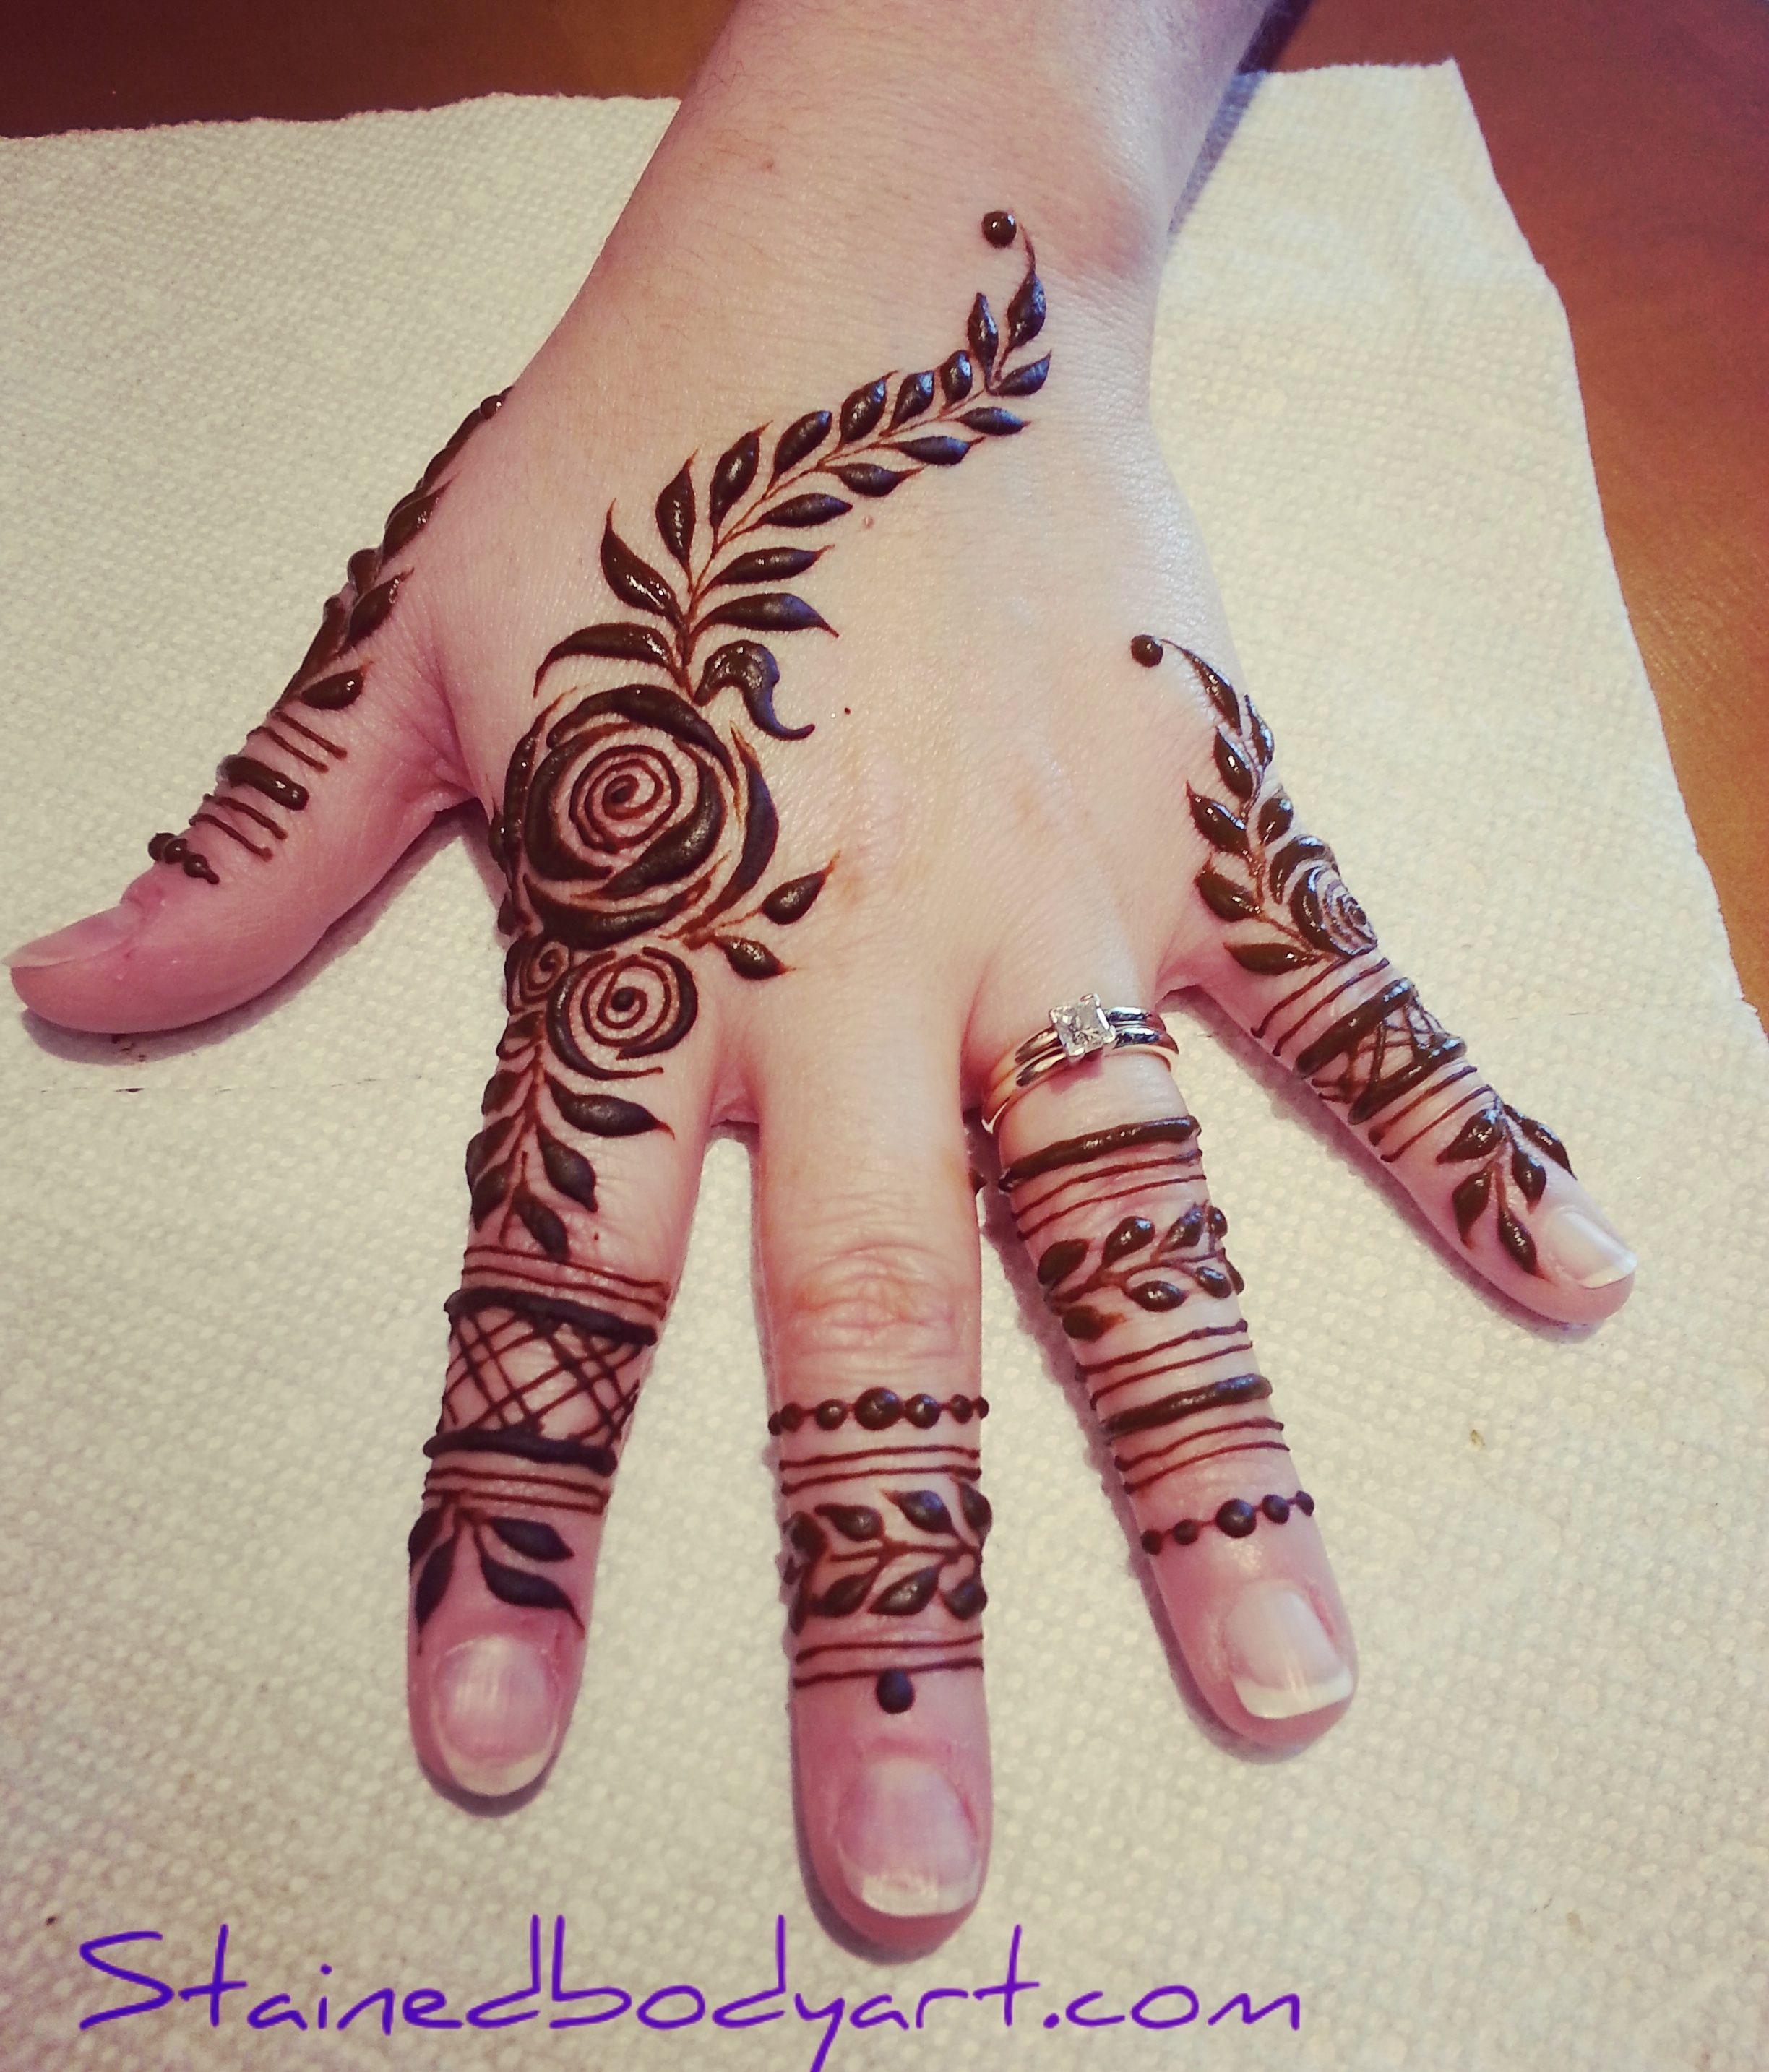 syeda Fatima (syedaffatima94) on Pinterest